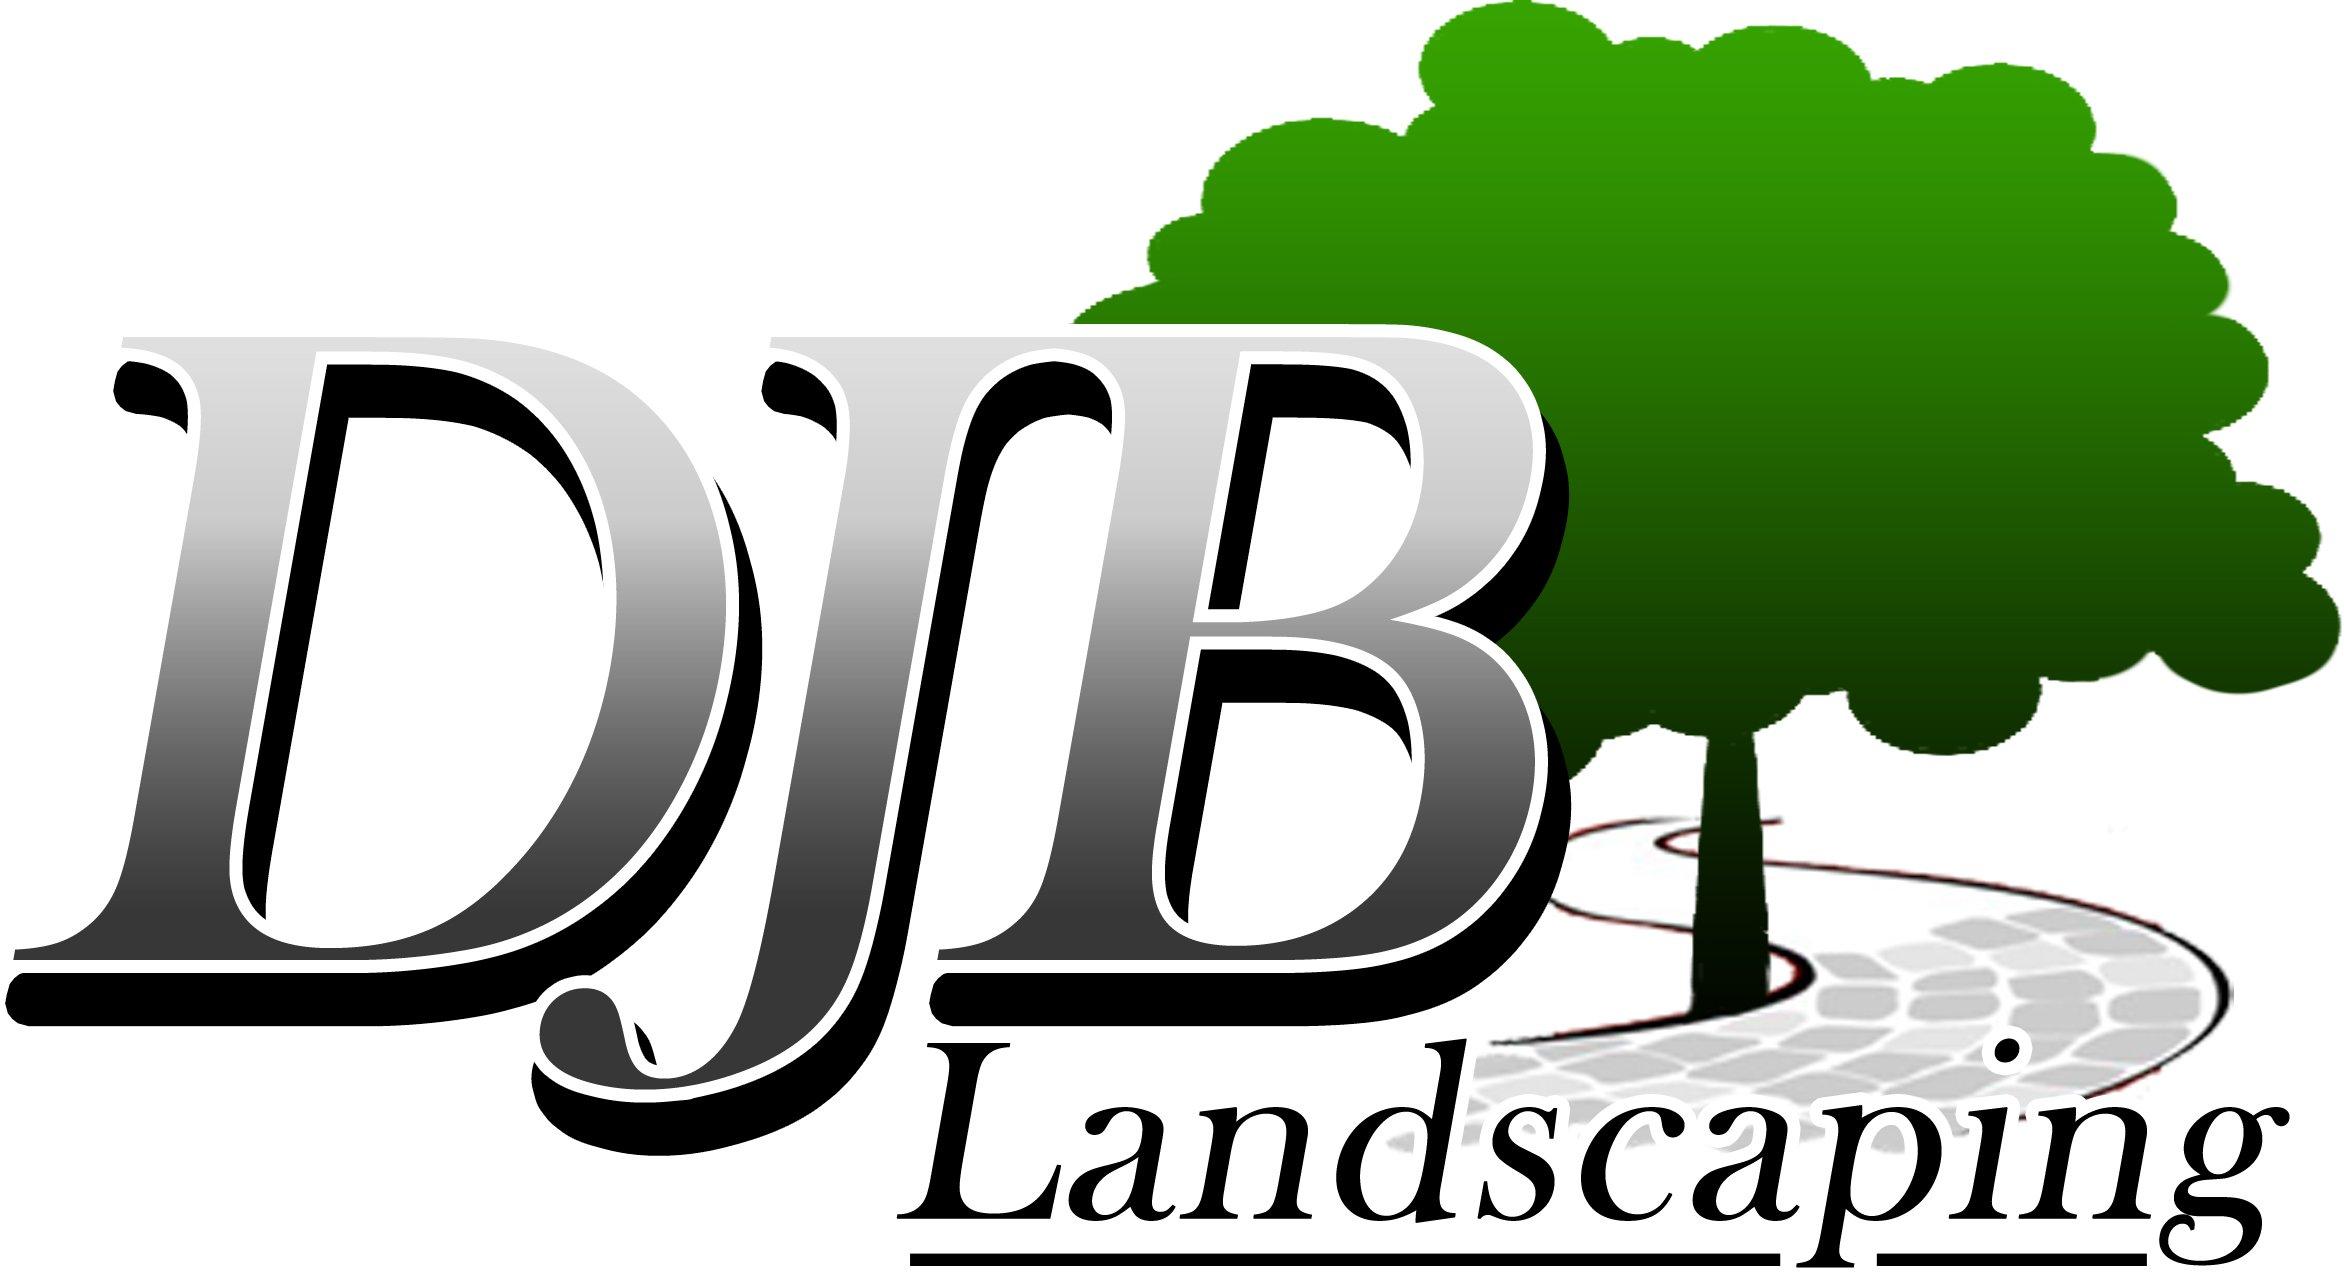 Landscaping Shelby Township Landscape Design MI